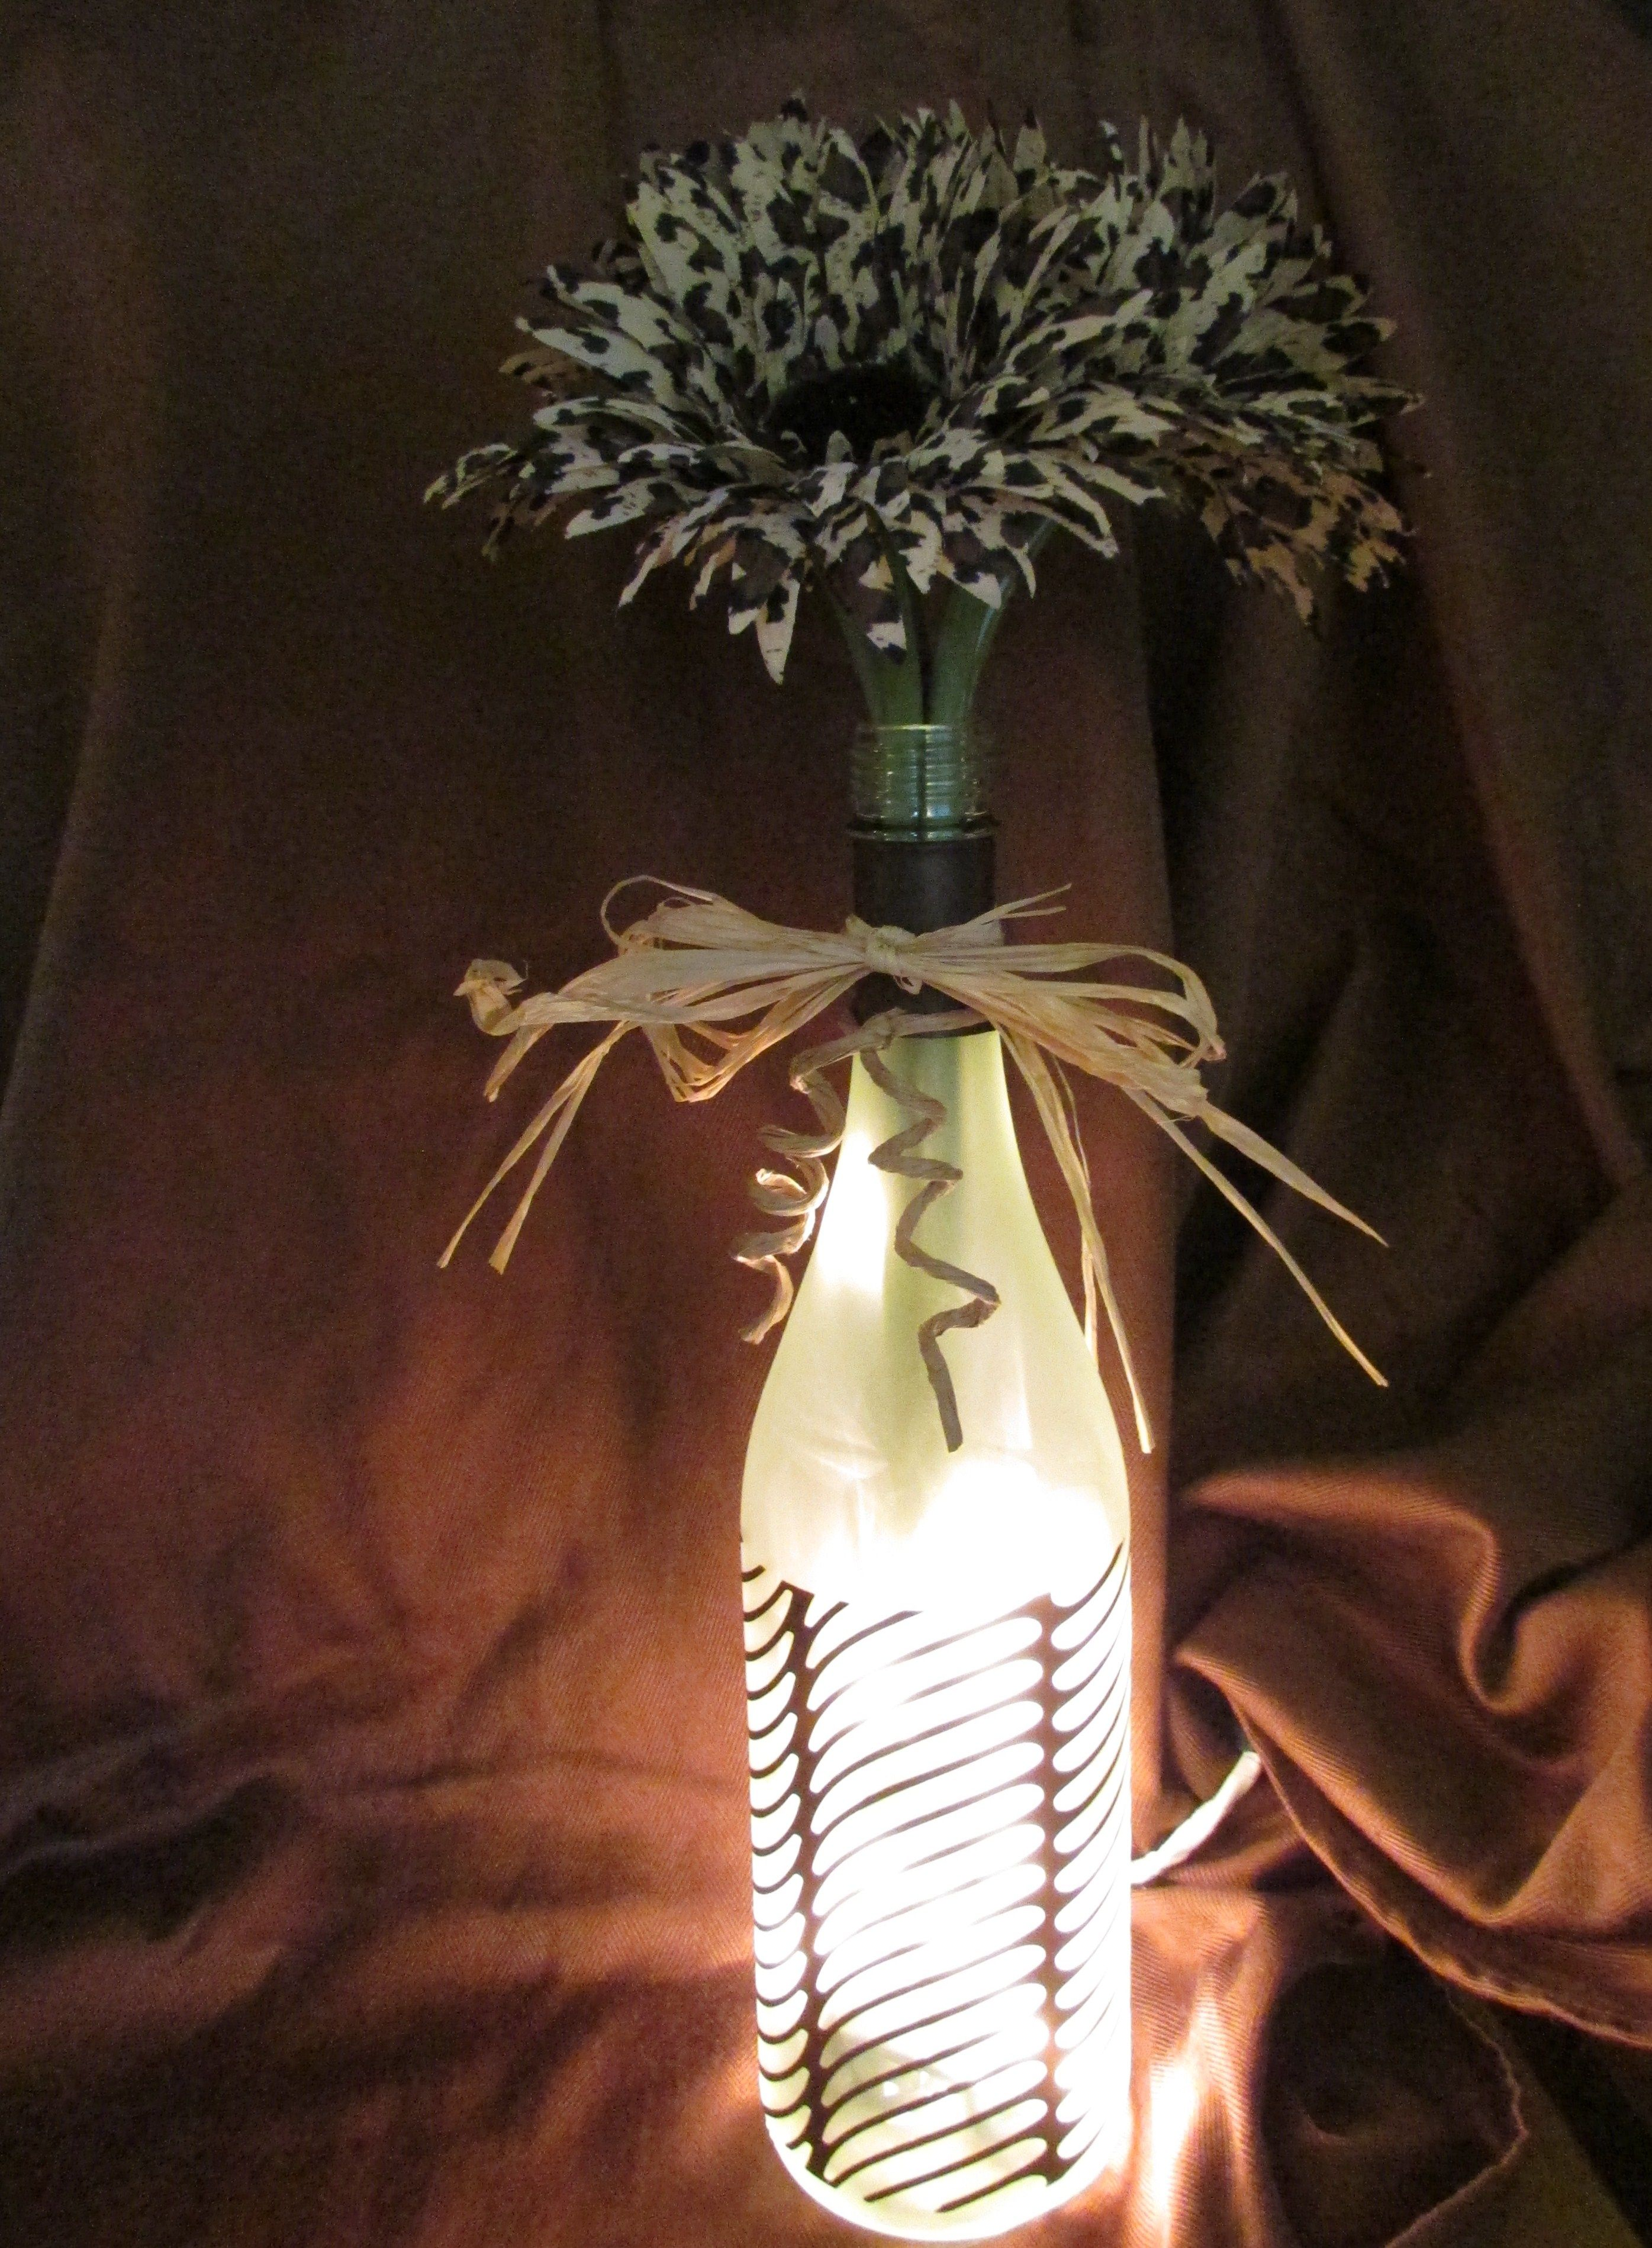 Brown print flowers and brown vinyl design on bottle